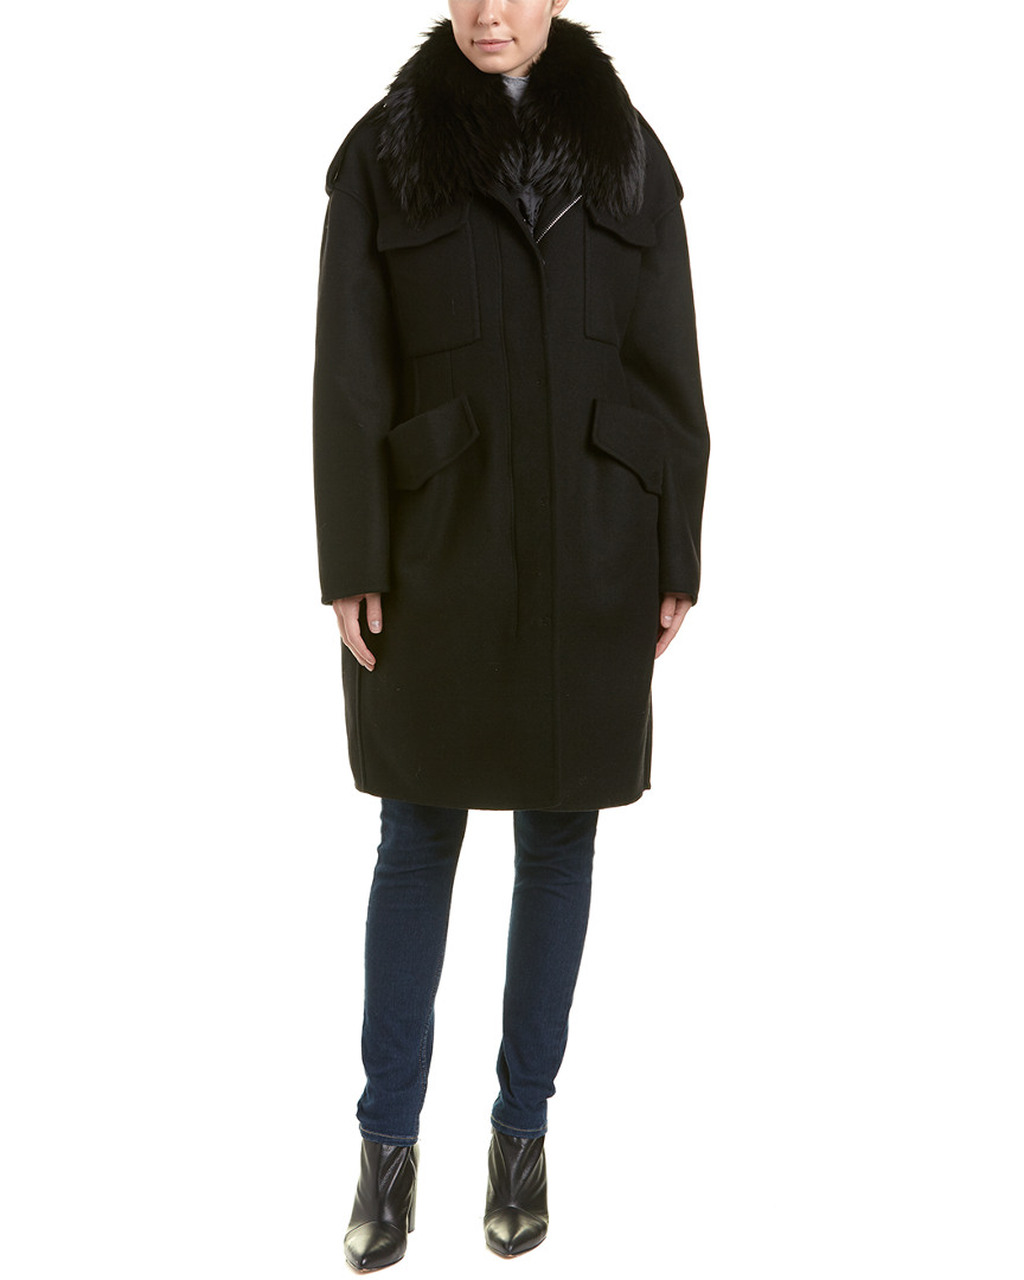 436b8a26c Moncler Philliera Wool   Cashmere-Blend Coat~1411583388 - Carsons